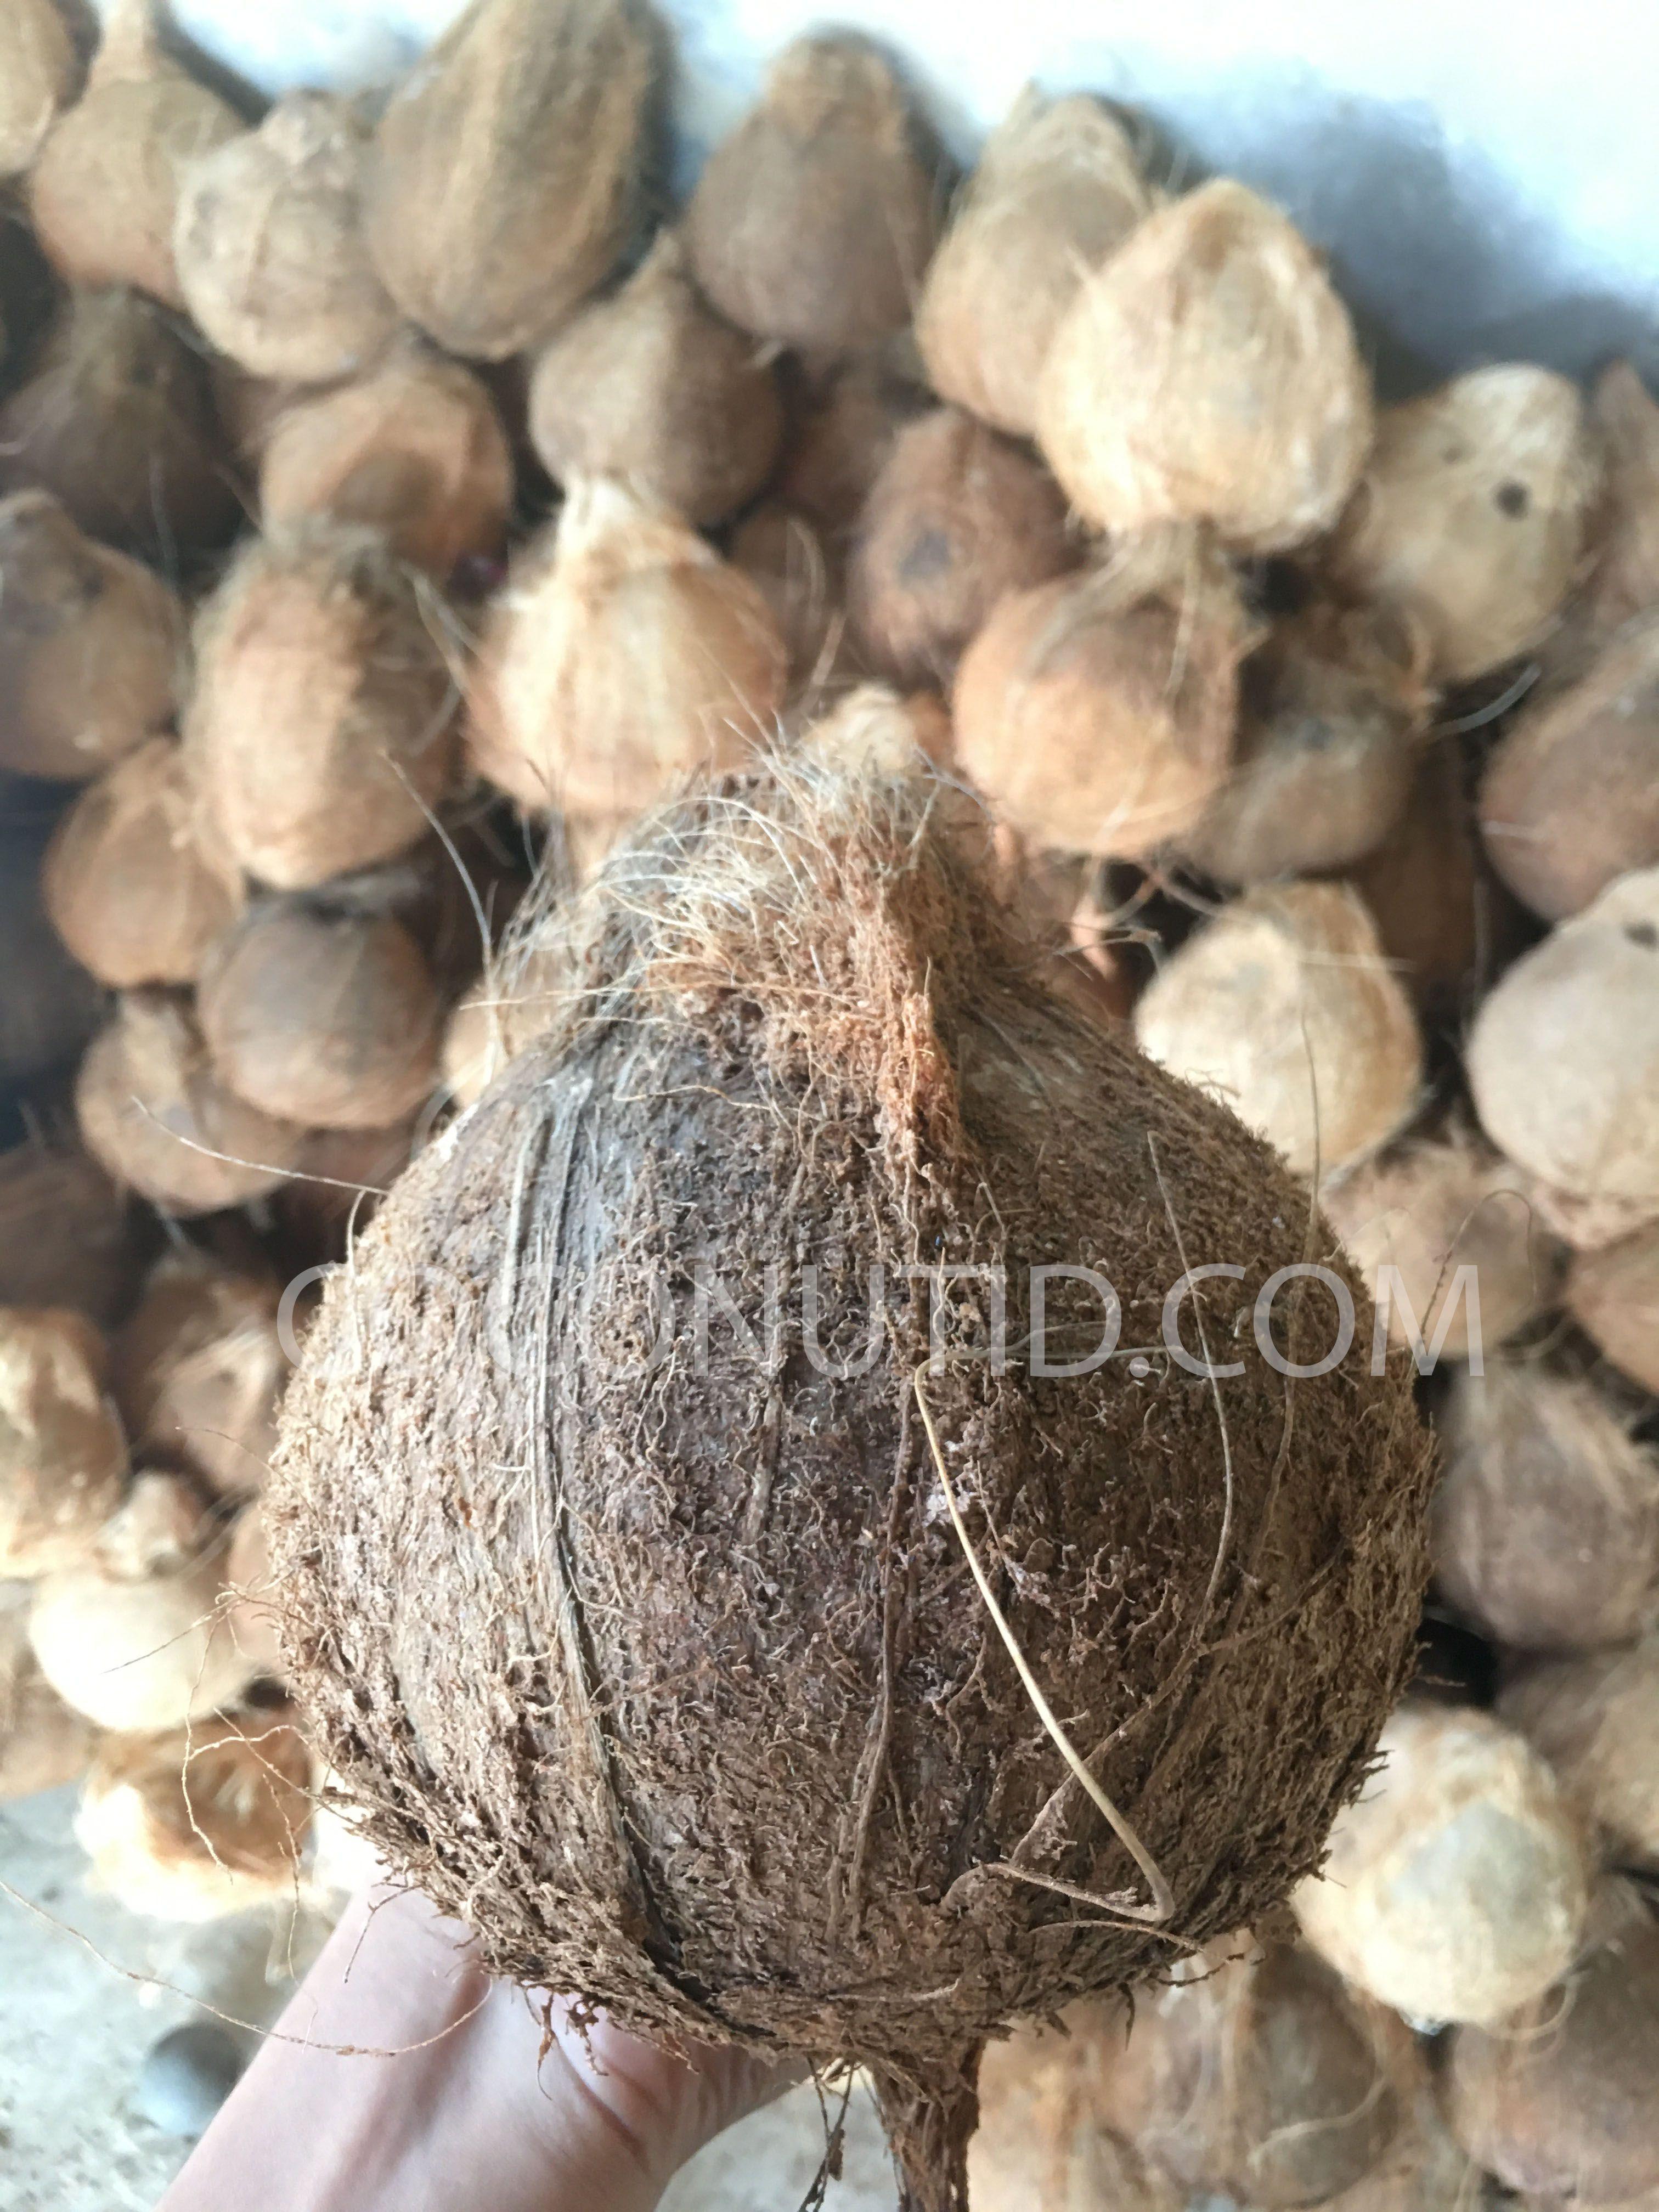 Coconut Semi husked Premium Quality